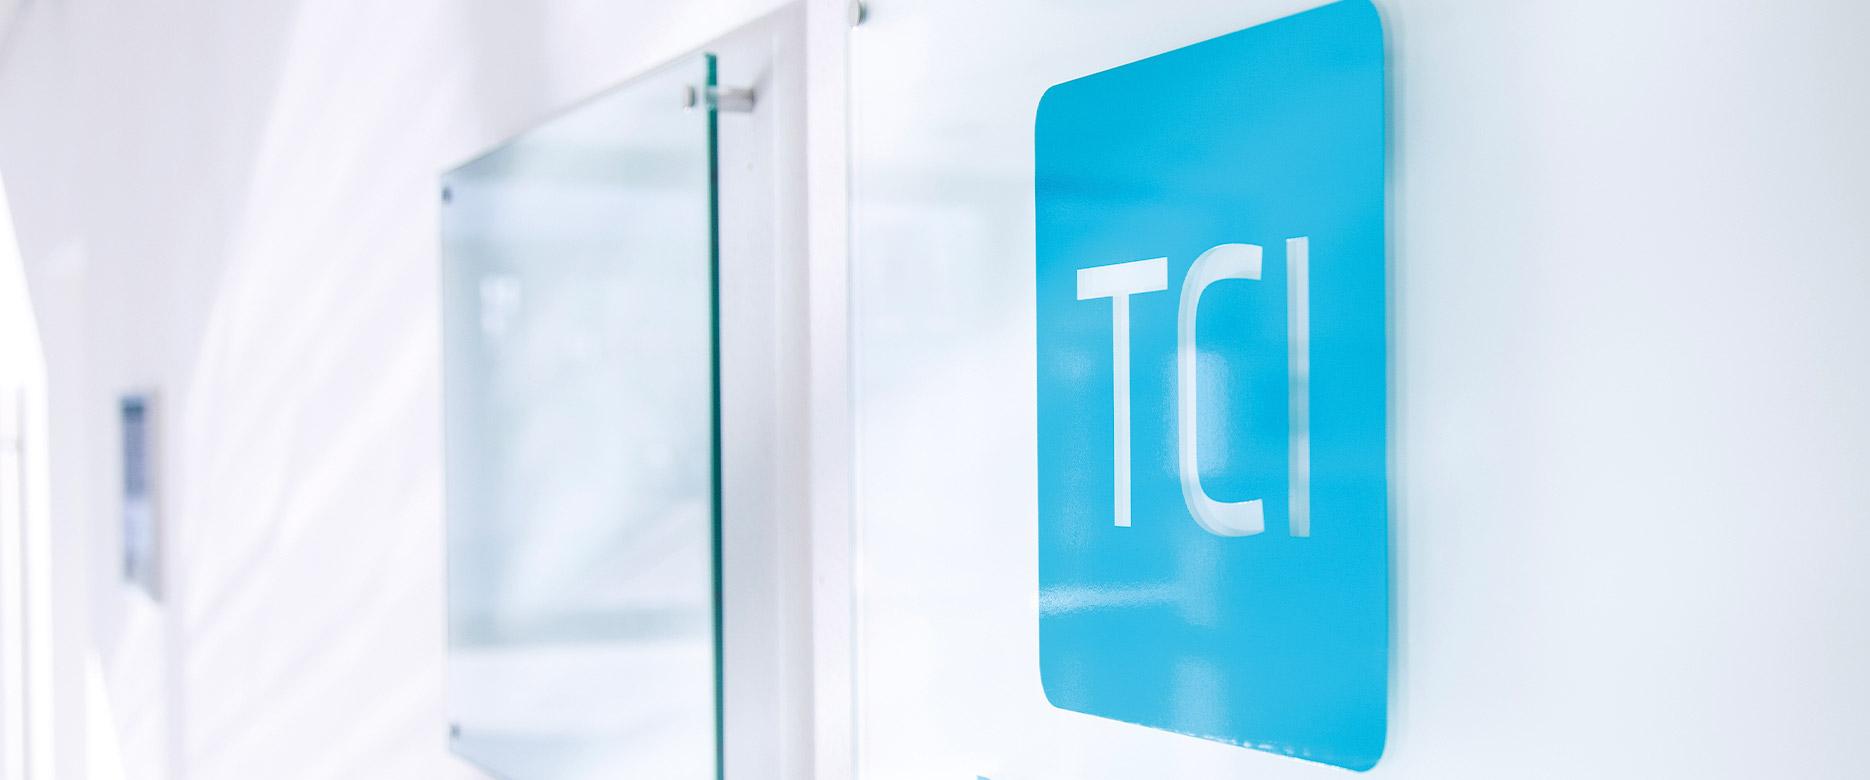 TCI Rechtsanwälte